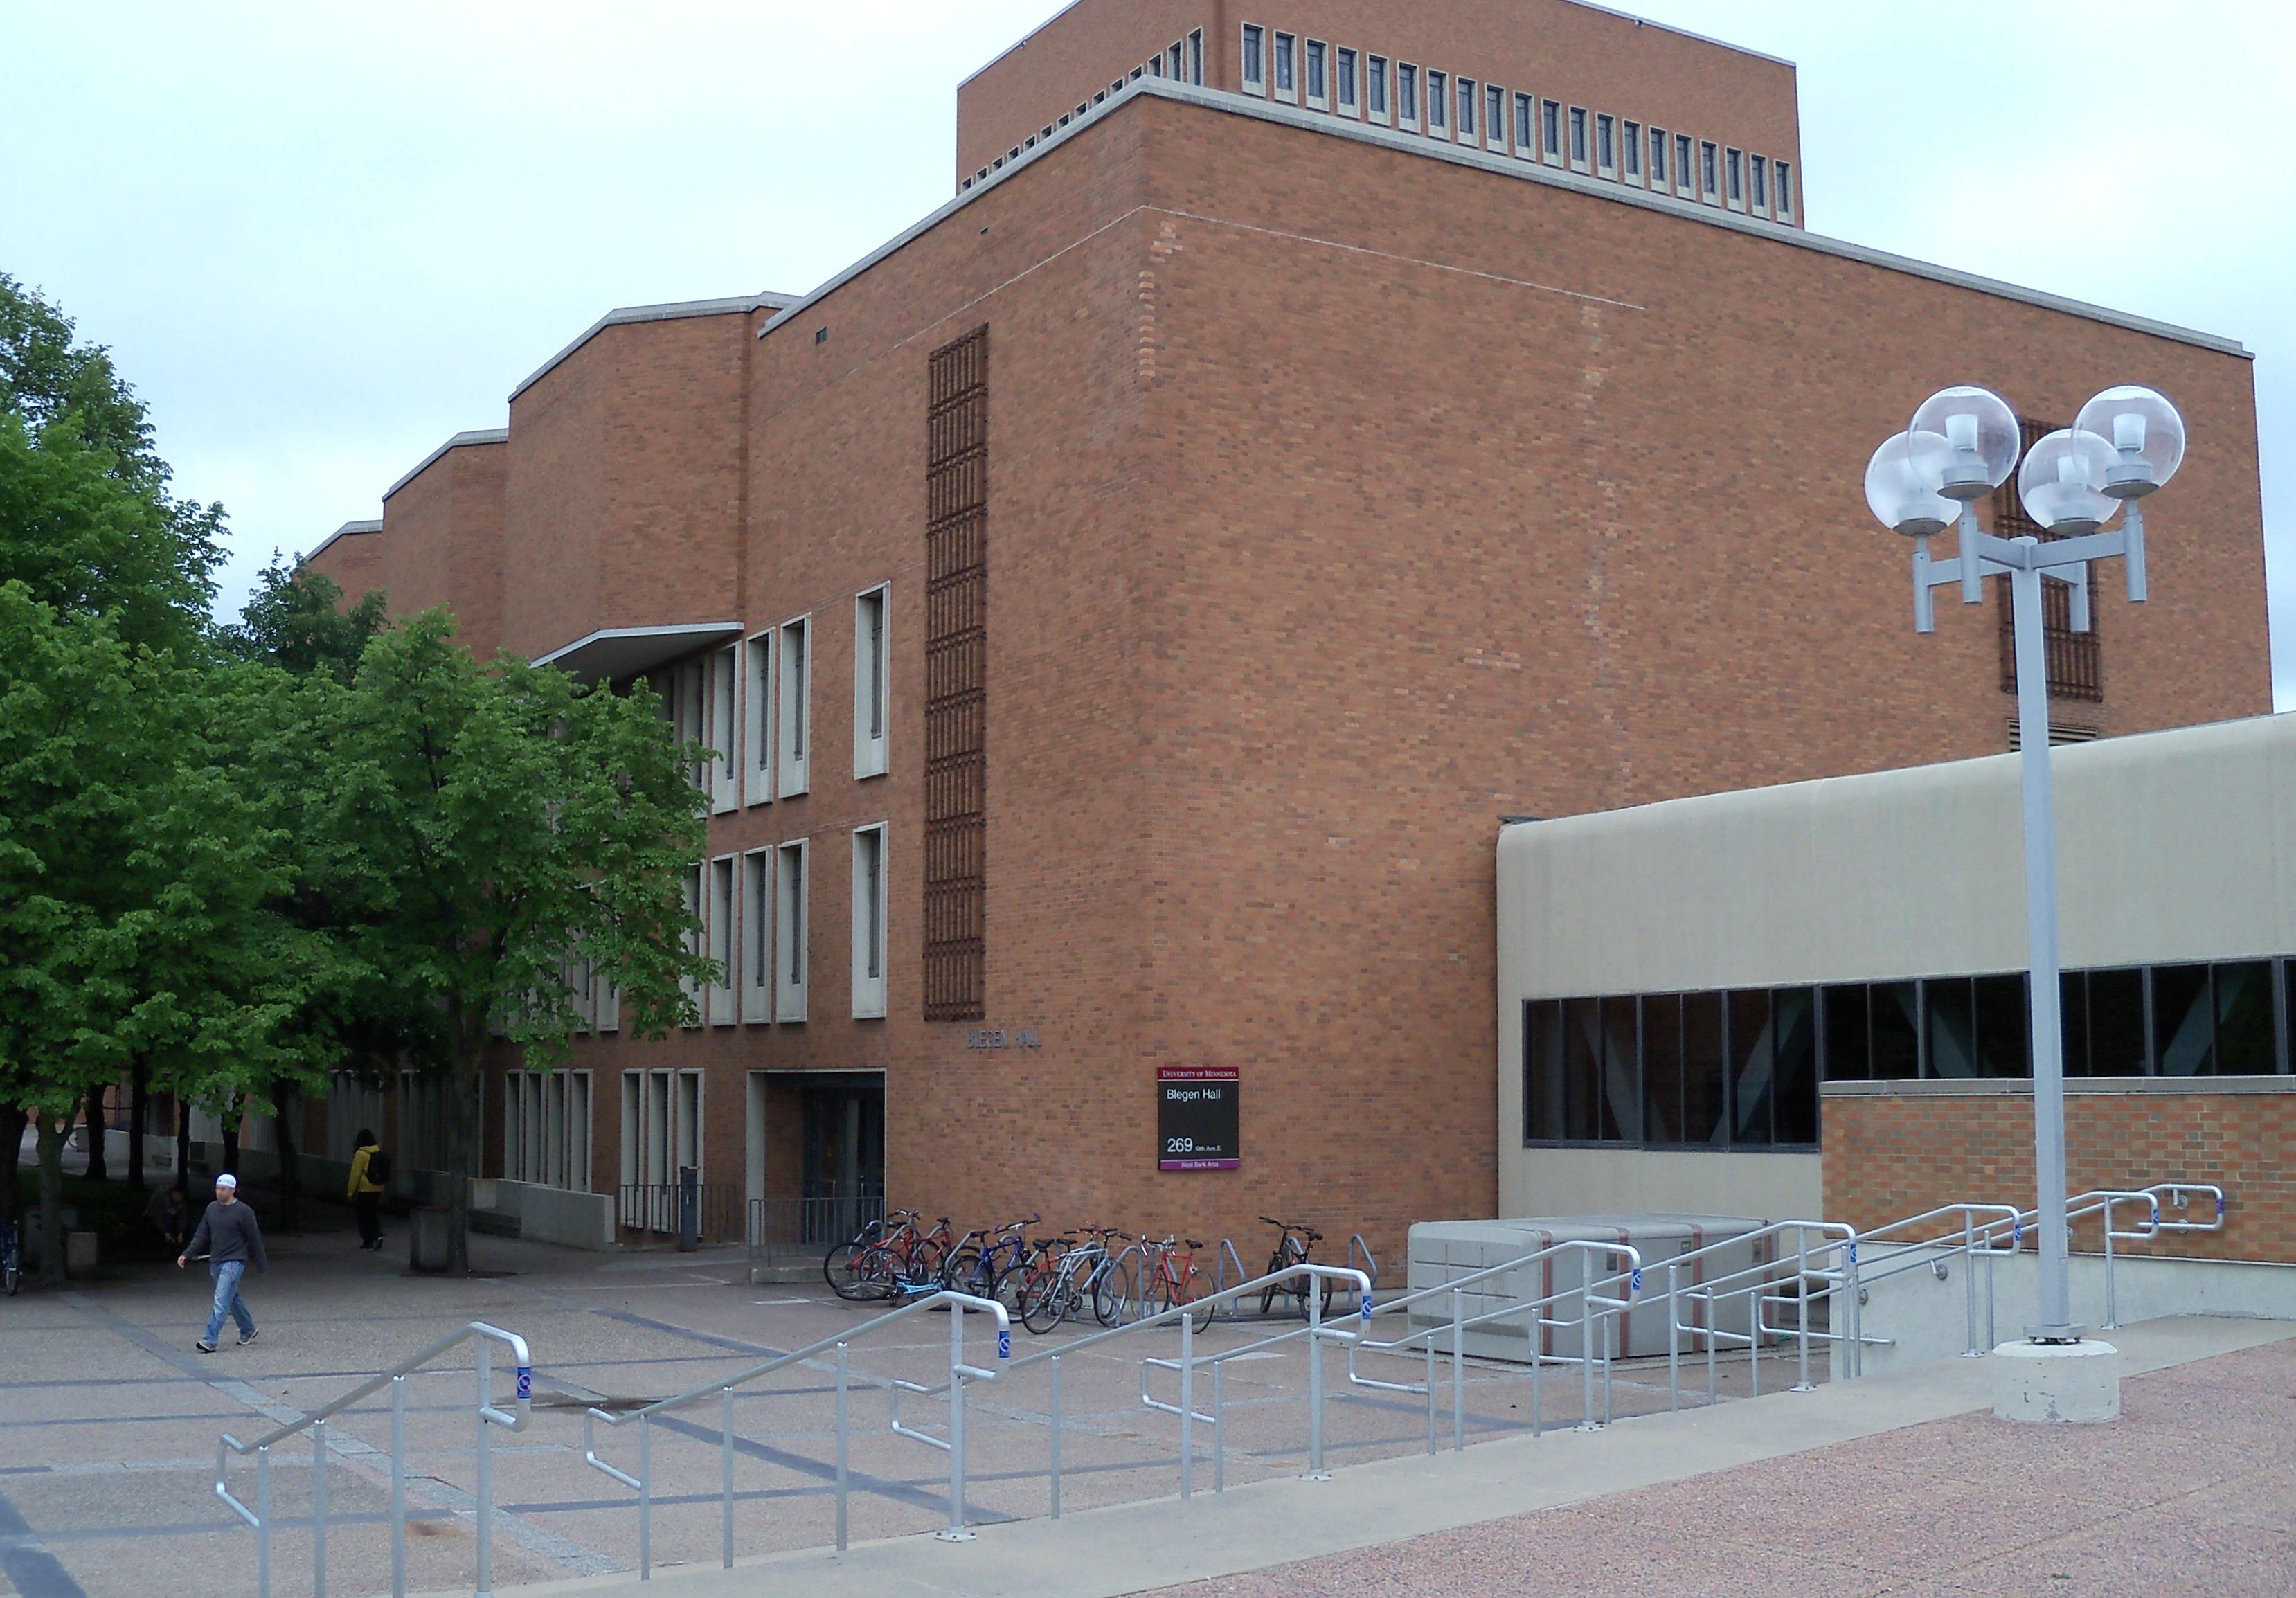 Blegen Hall on the Minneapolis campus of the University of Minnesota